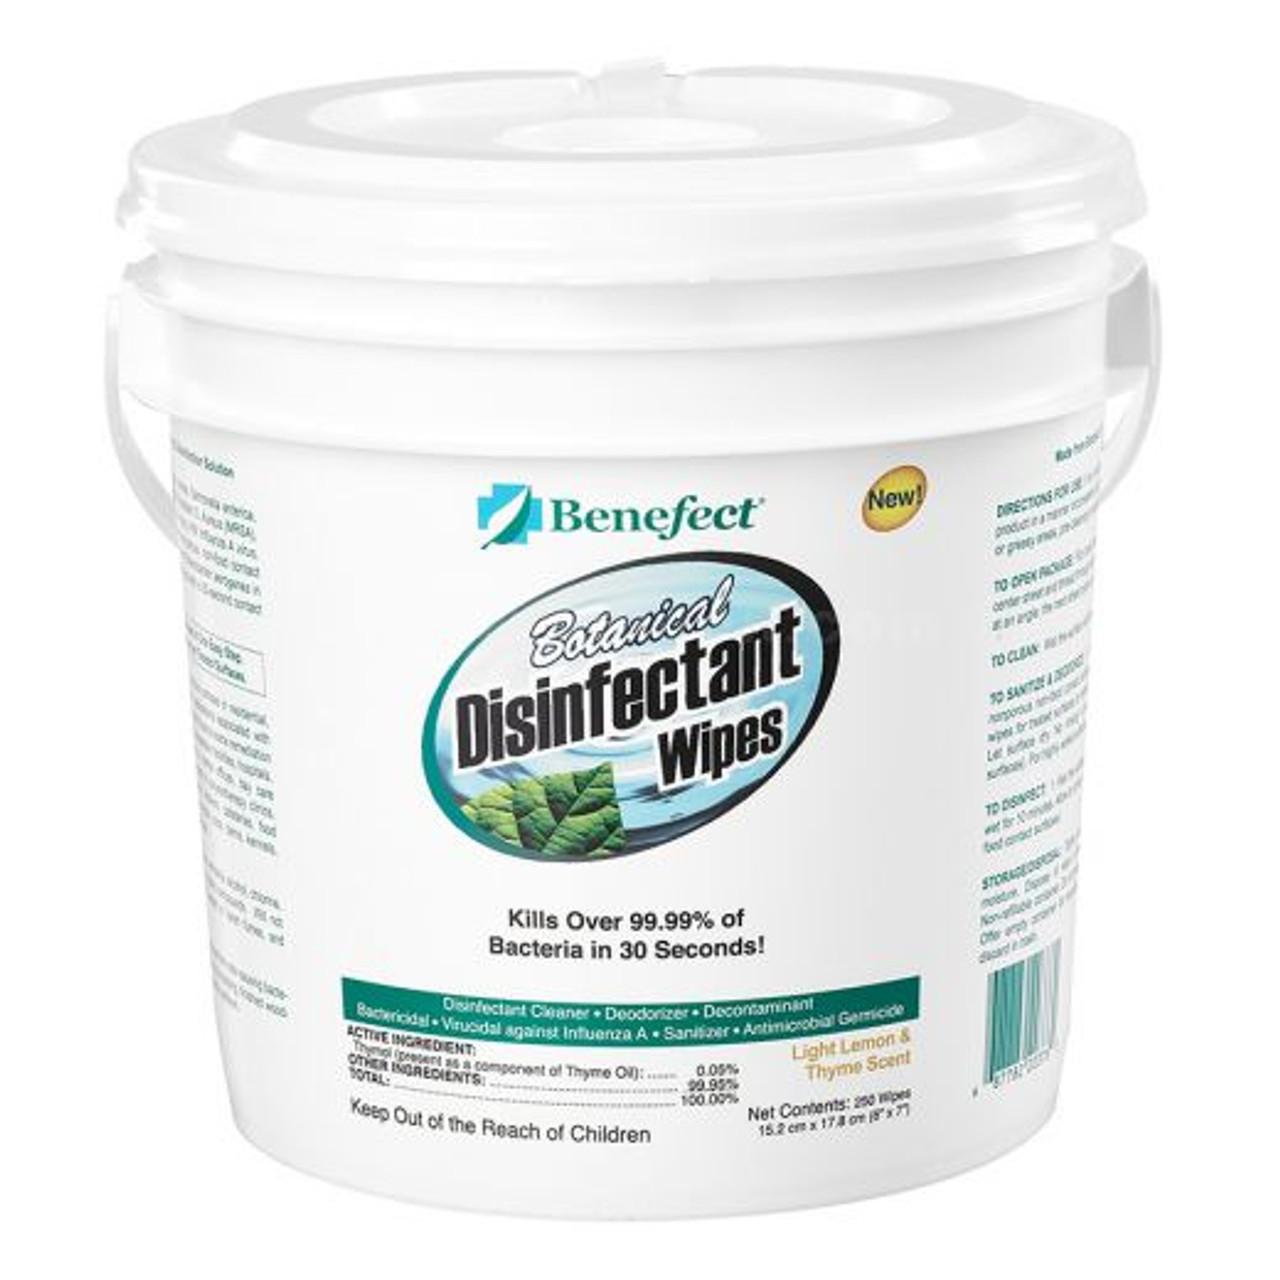 Benefect Botanical Disinfectant Wipes